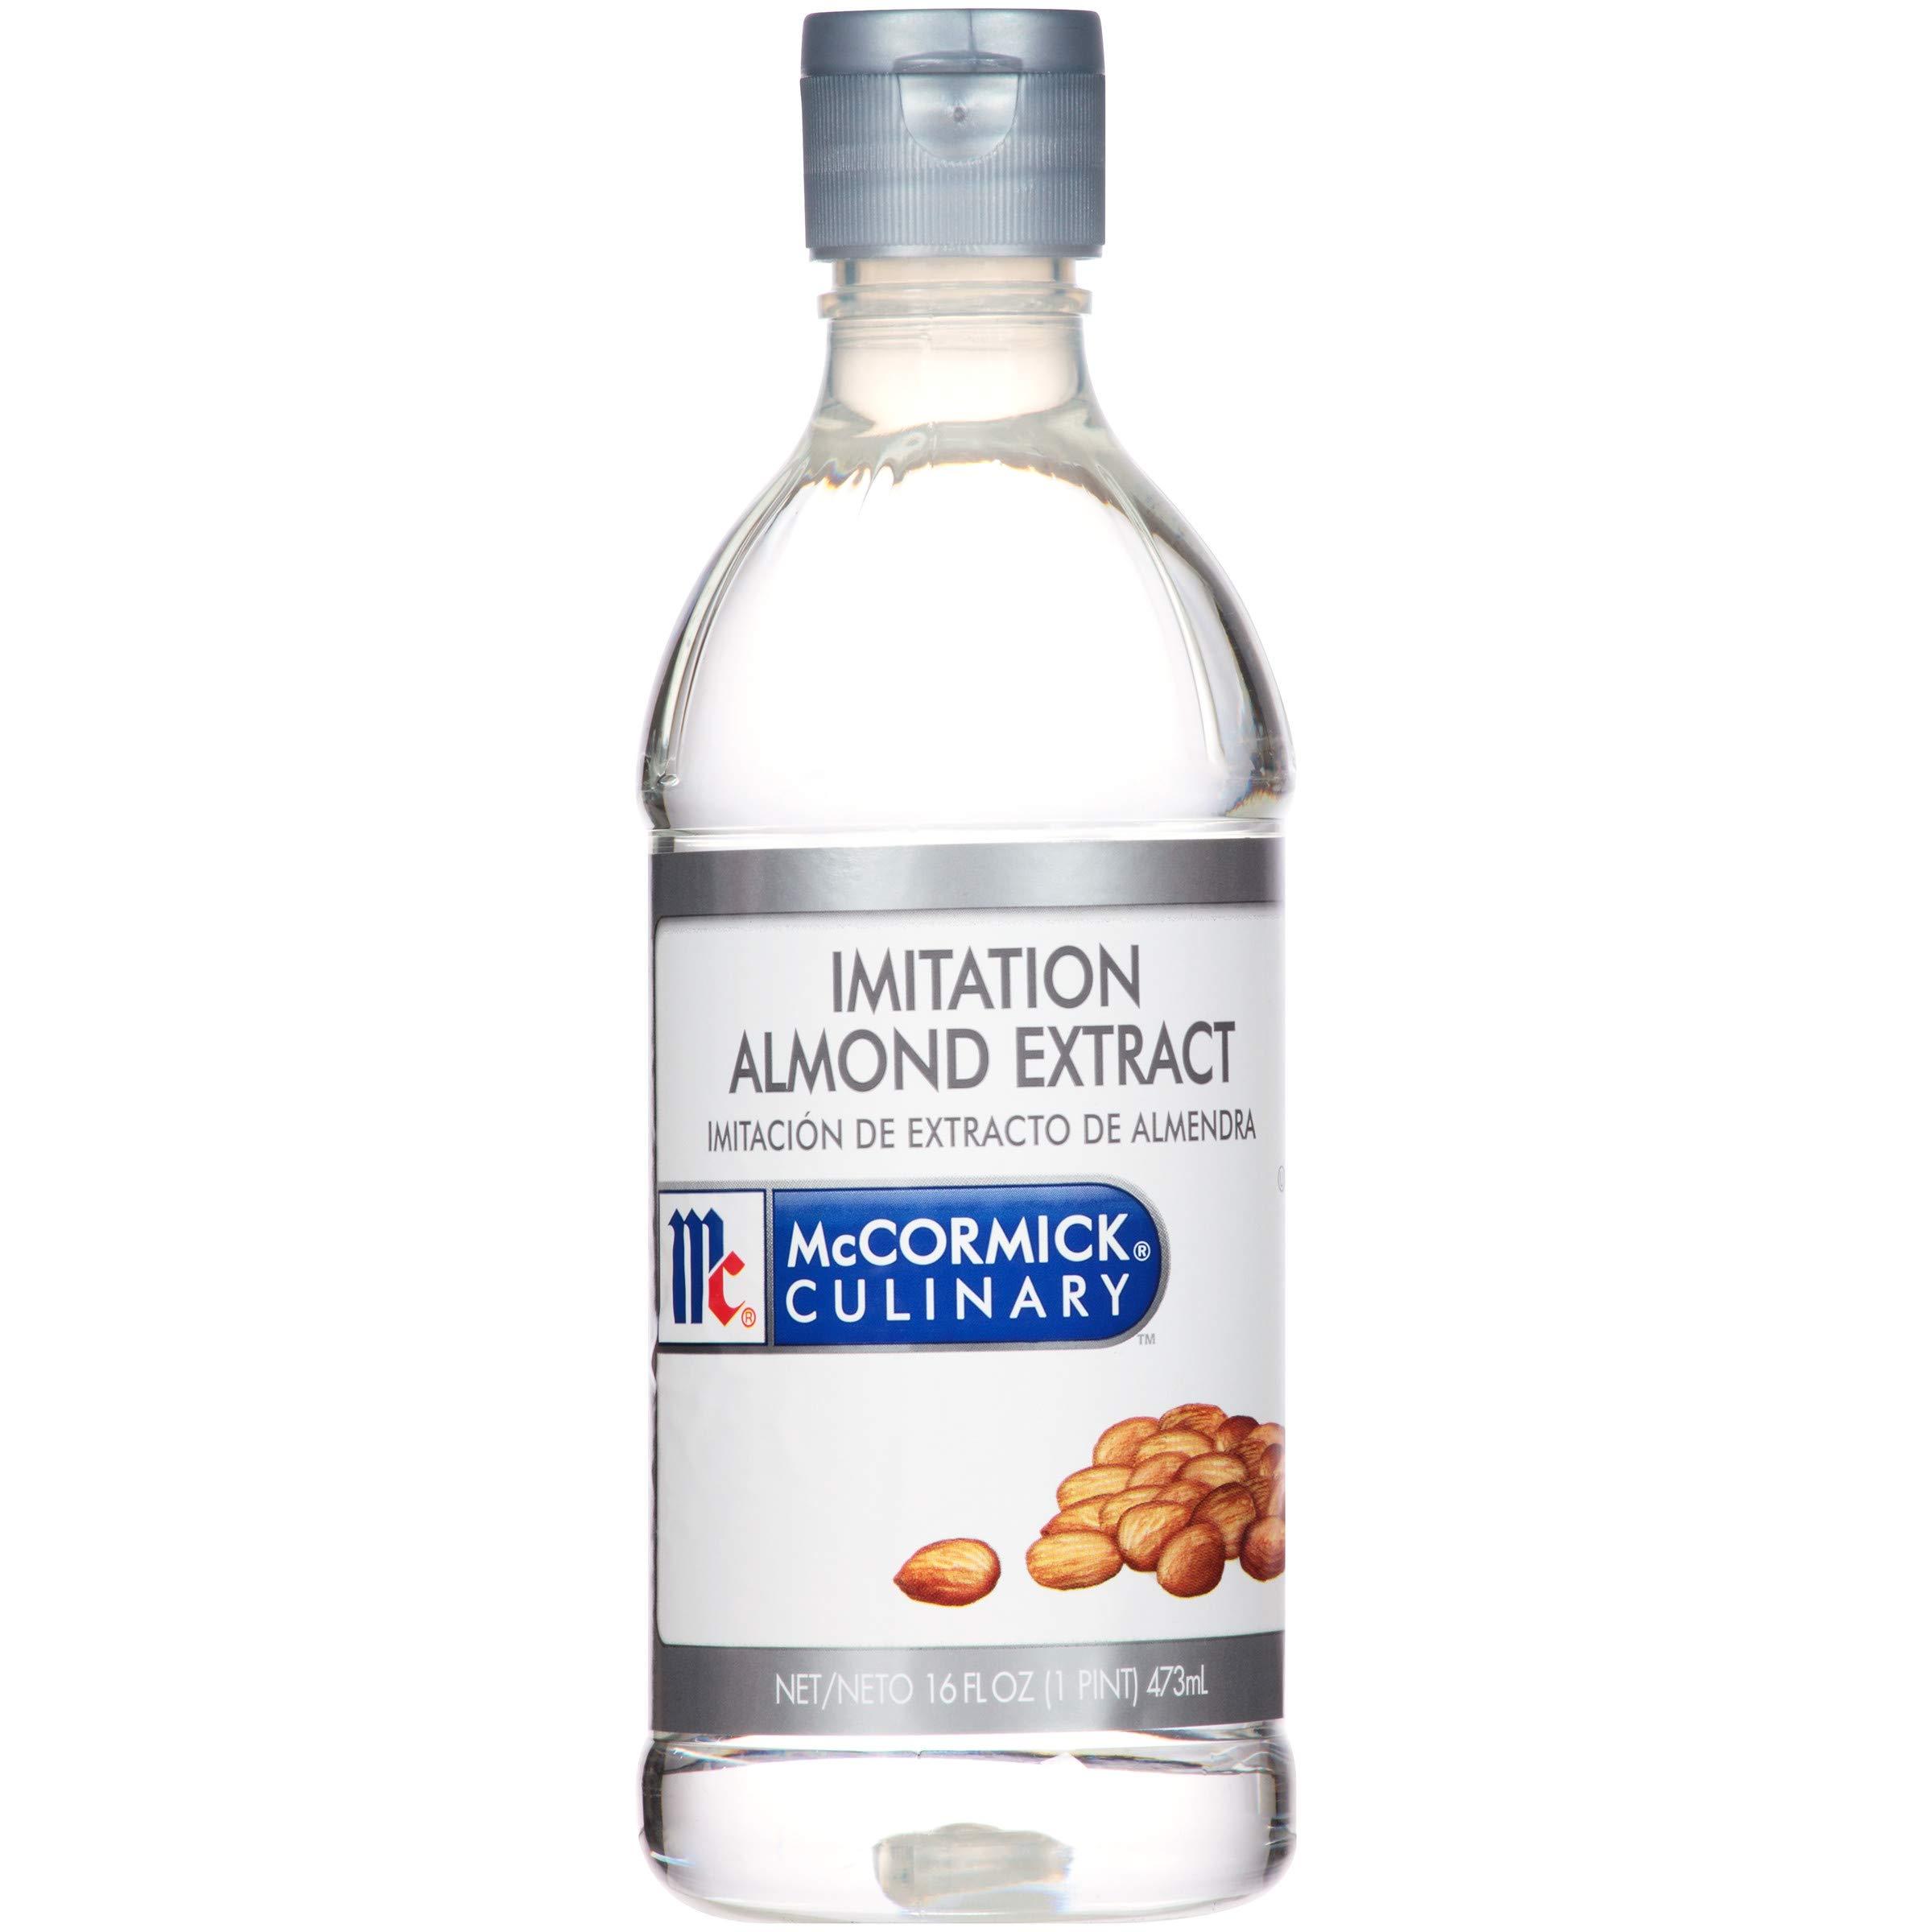 McCormick Culinary Imitation Almond Extract, 16 fl oz